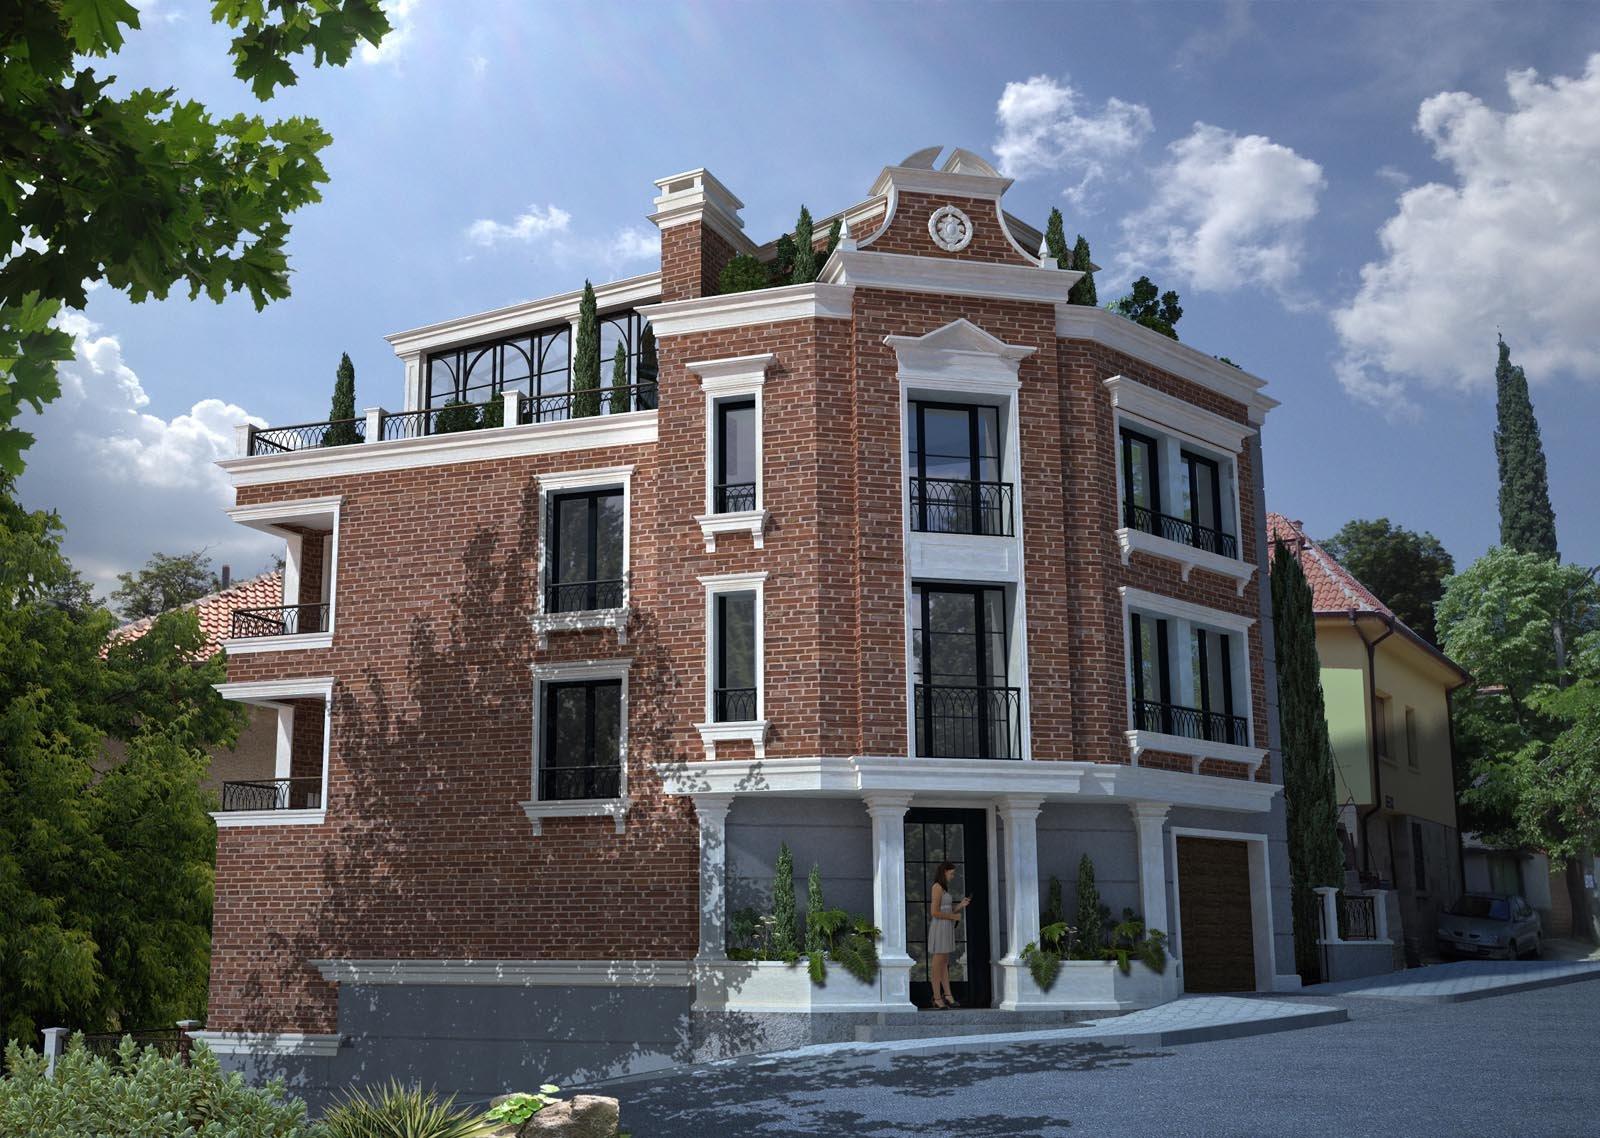 Stile E Prattica SPA Projects Reconstruction House